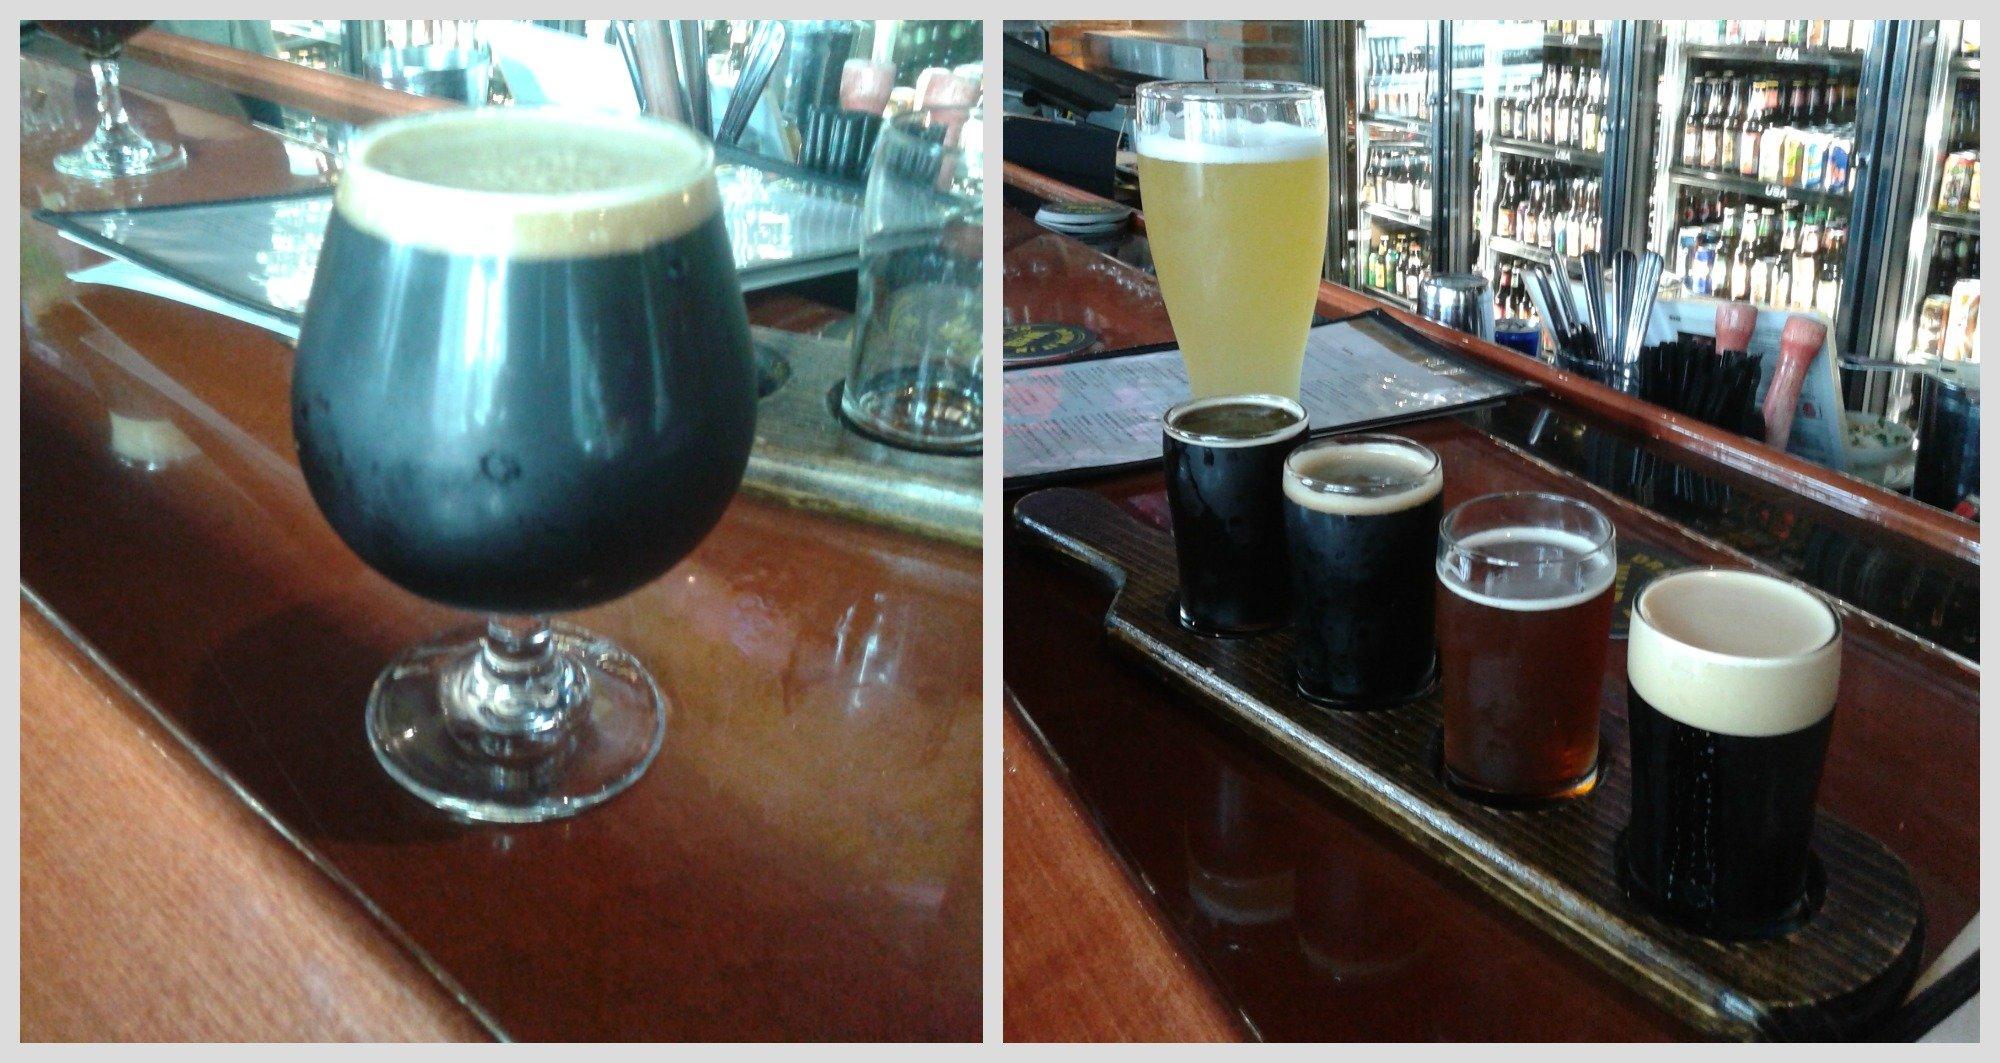 Friday Beer Date